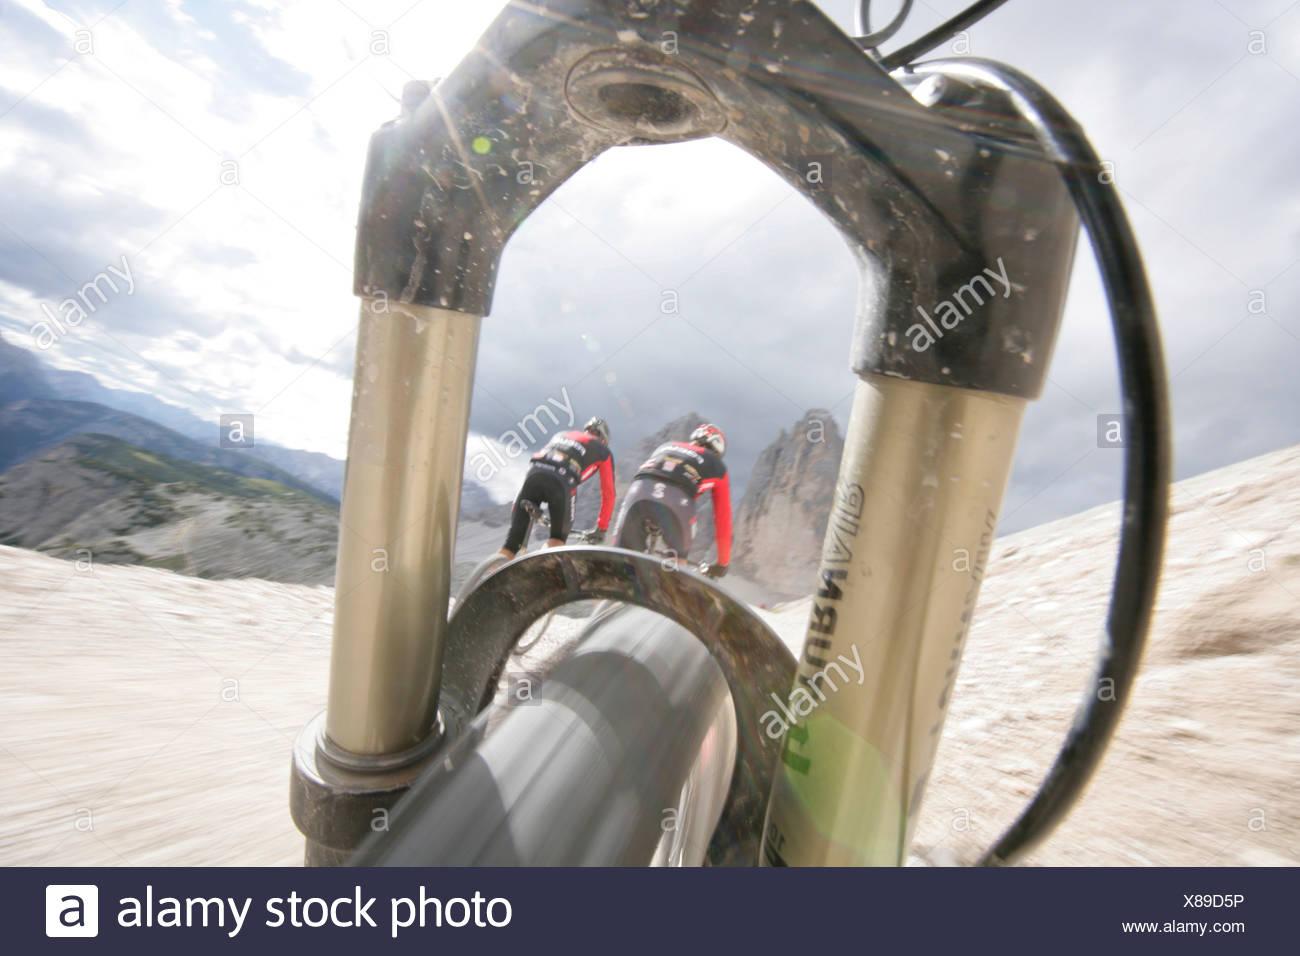 Persons mountain biking near Tre Cime di Lavaredo, Veneto, Italy - Stock Image